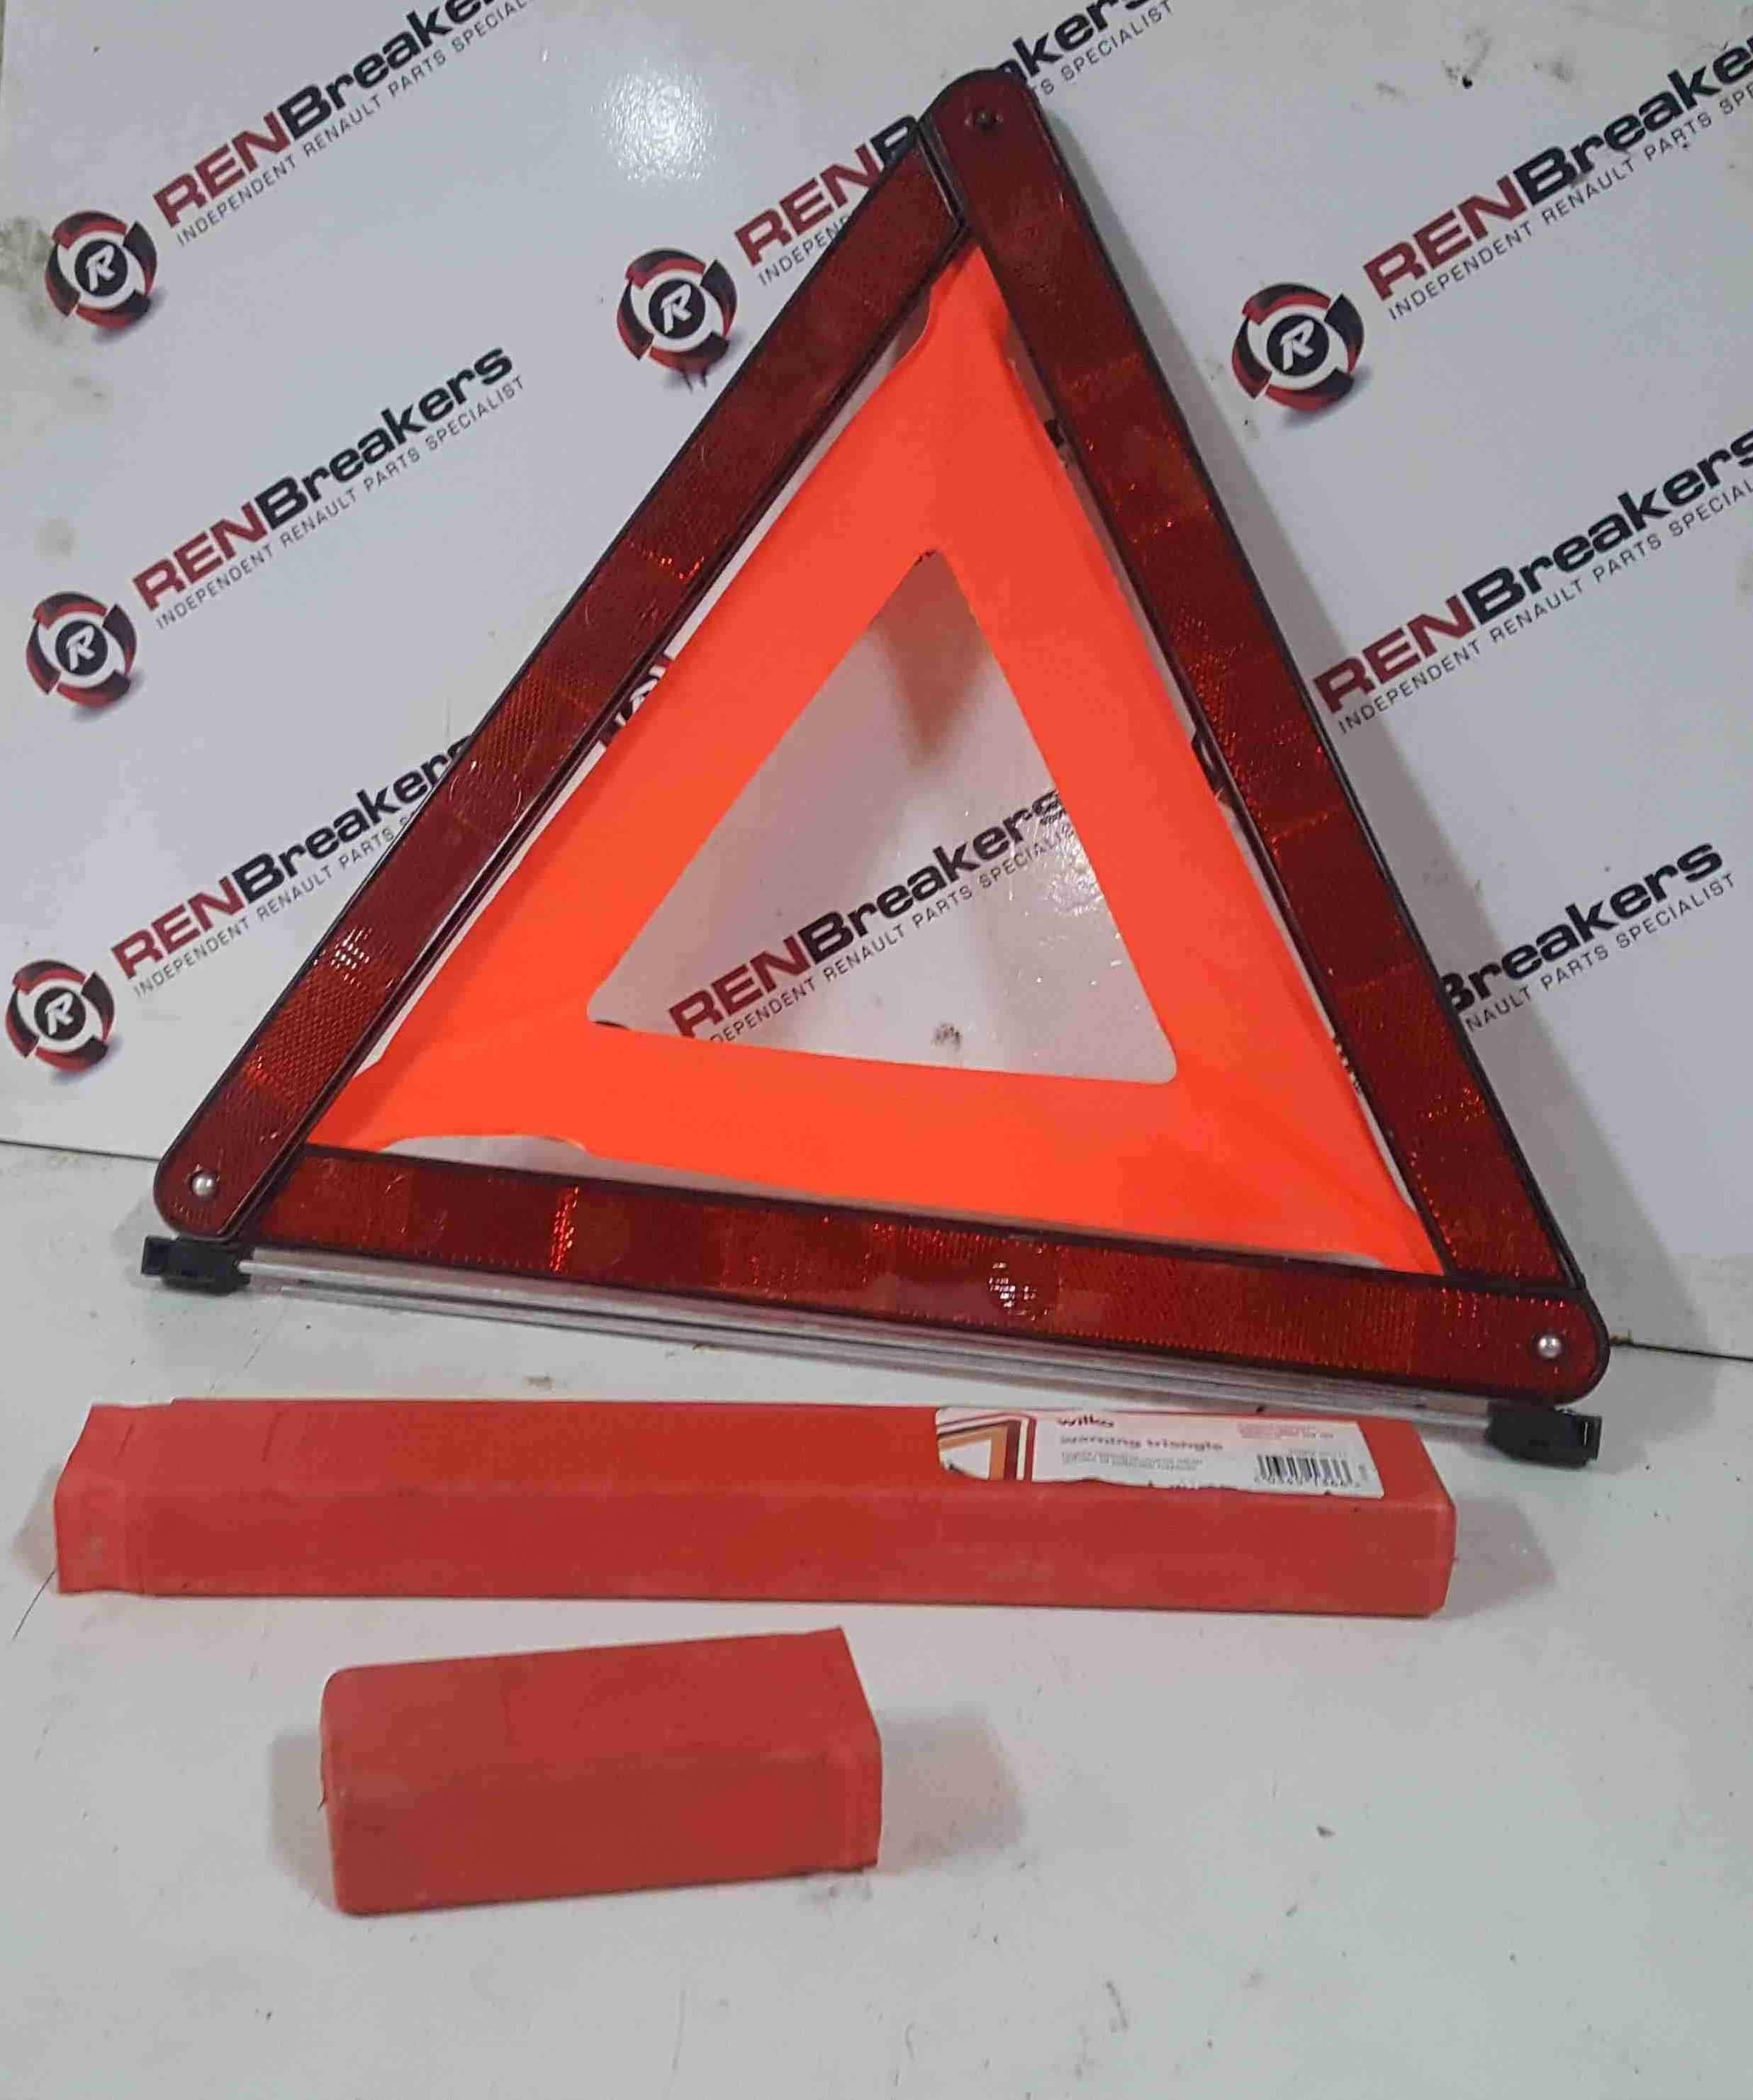 Renault Clio Megane Scenic 2003-2009 Warning Triangle